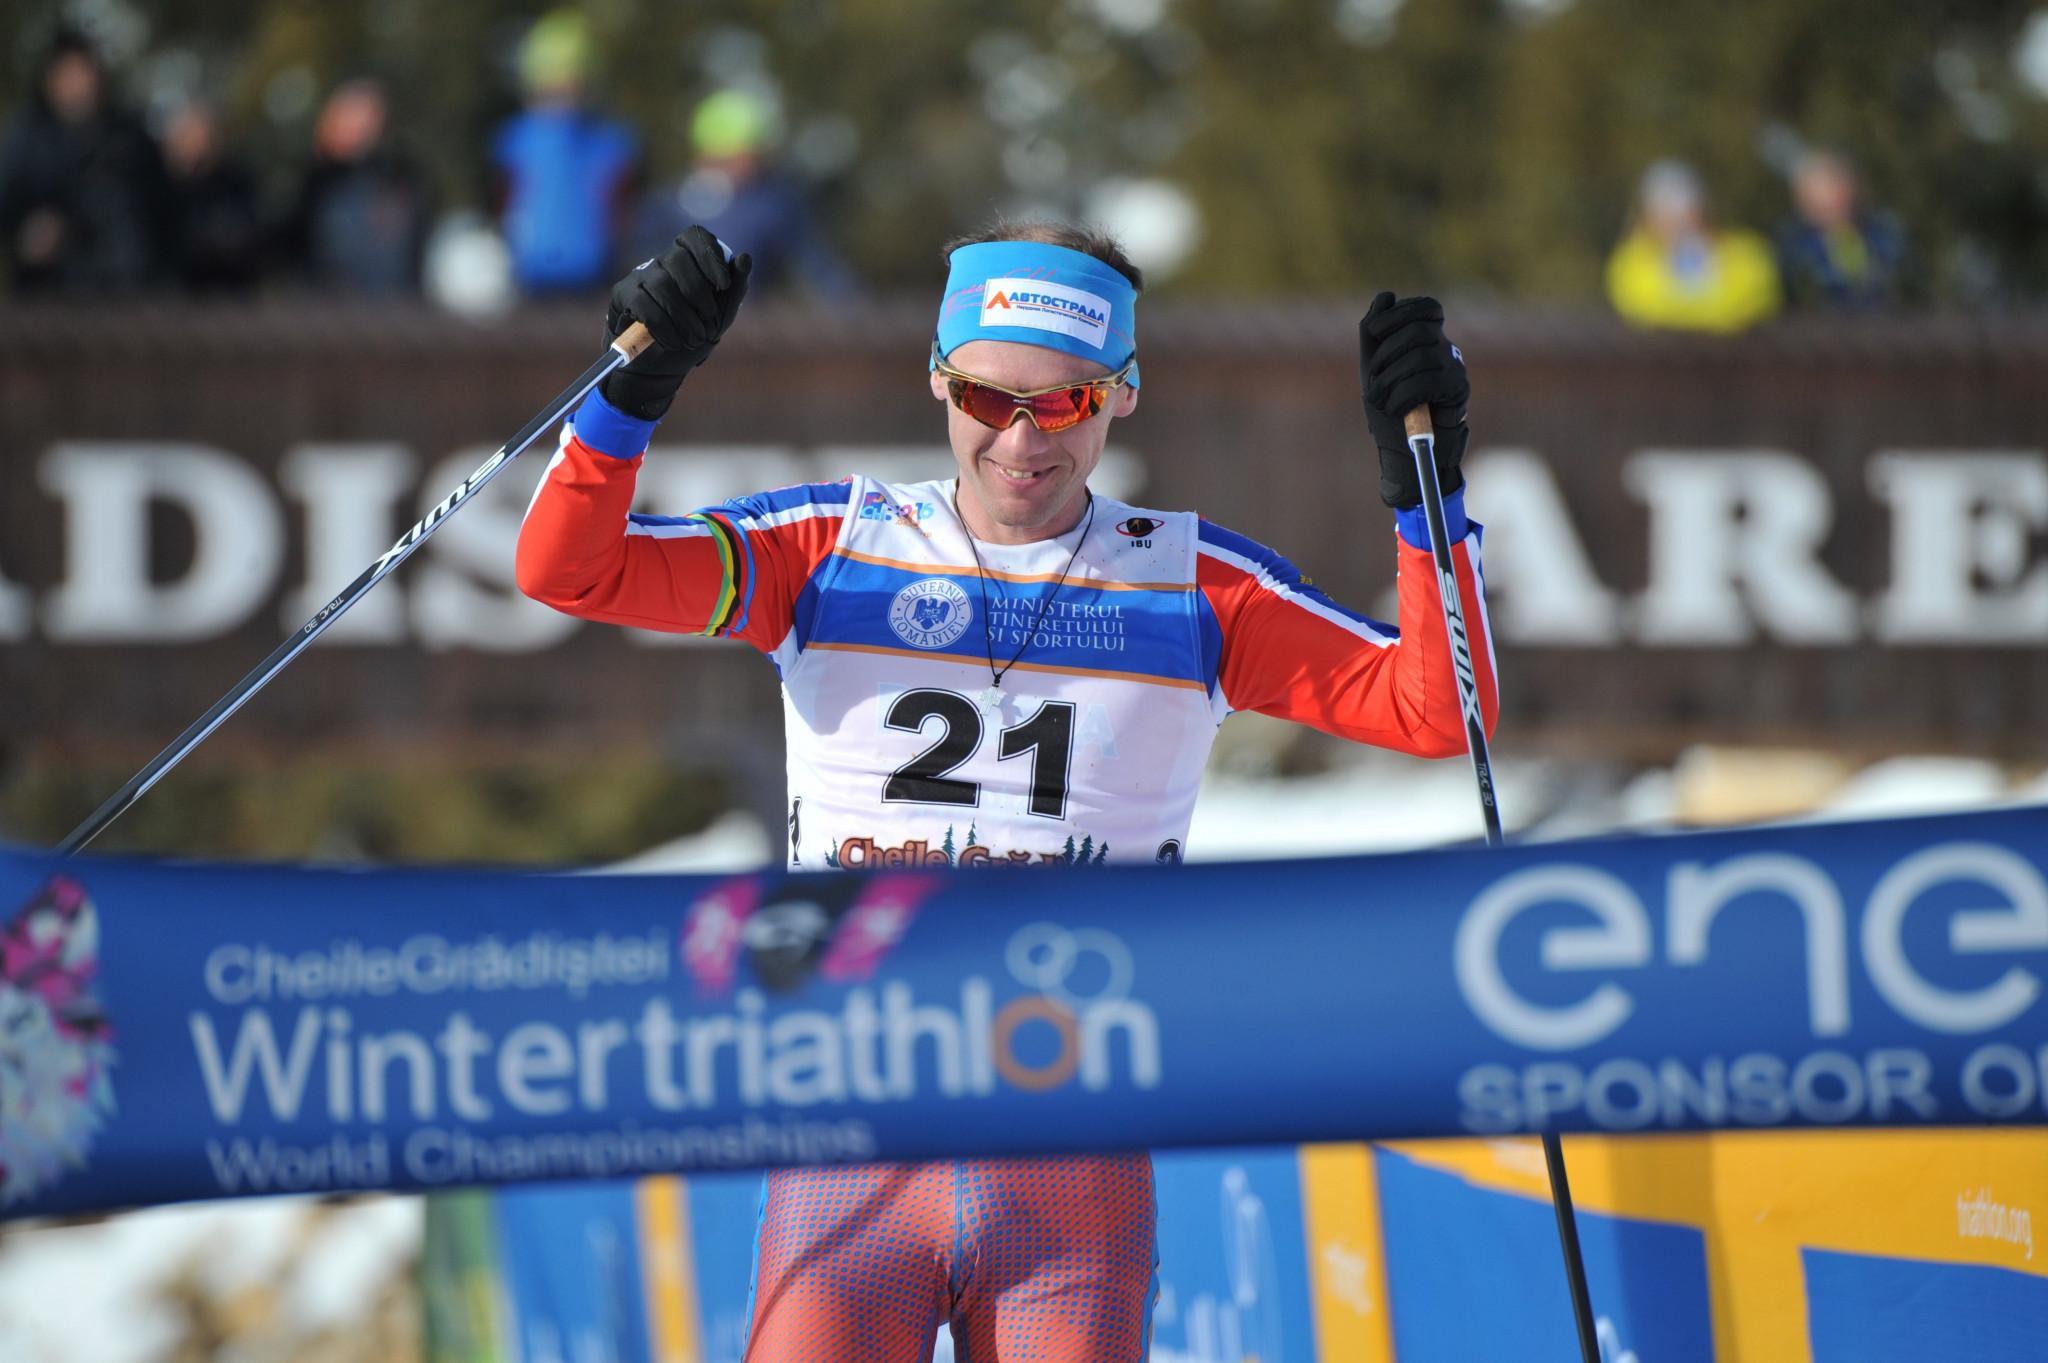 Cheile Grădiştei set to host ETU Winter Triathlon European Championships